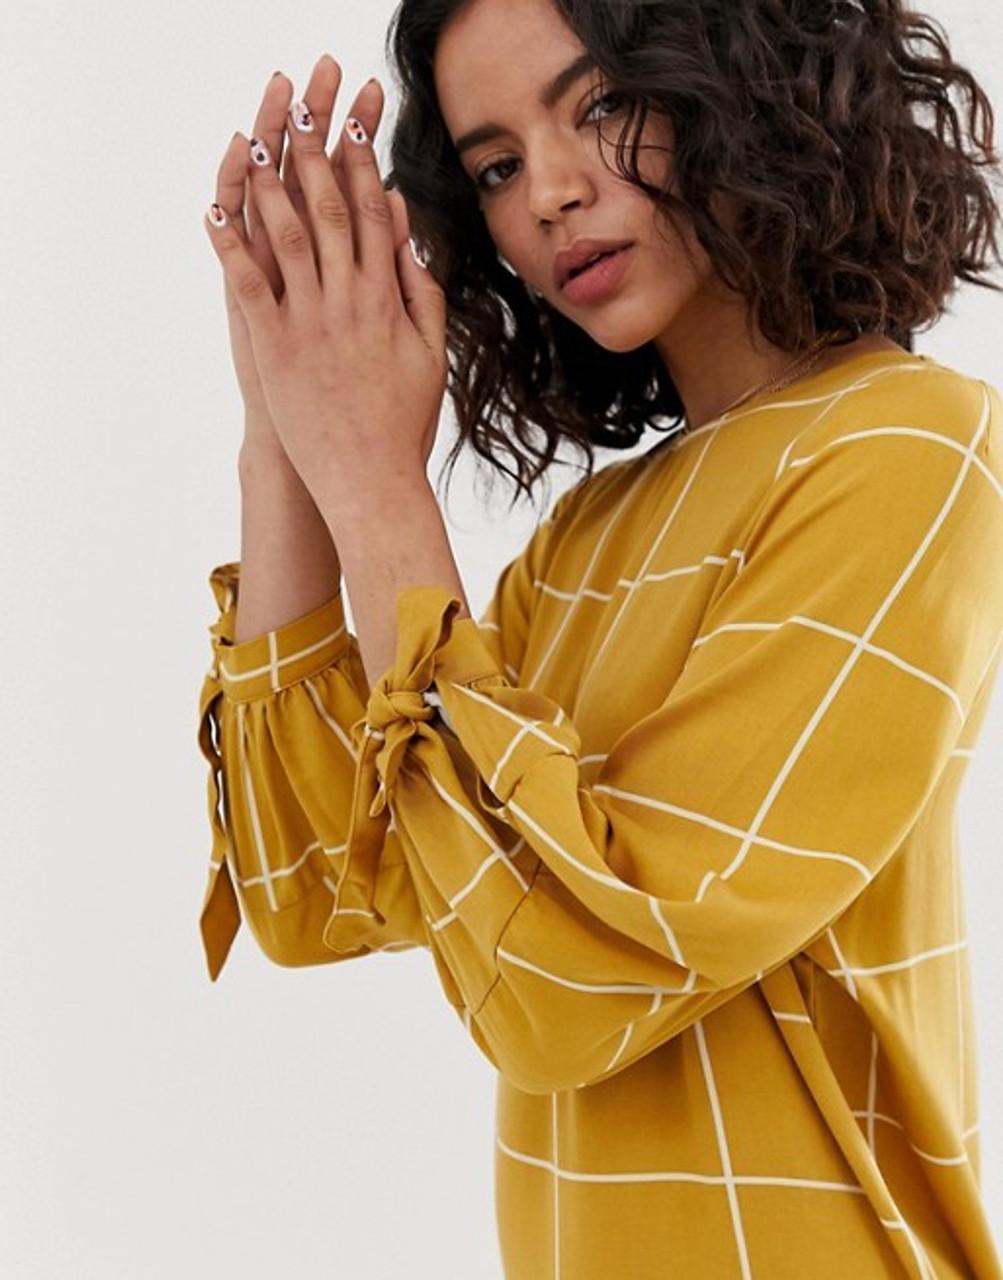 Grid Check Print Tie Sleeve Midi Dress